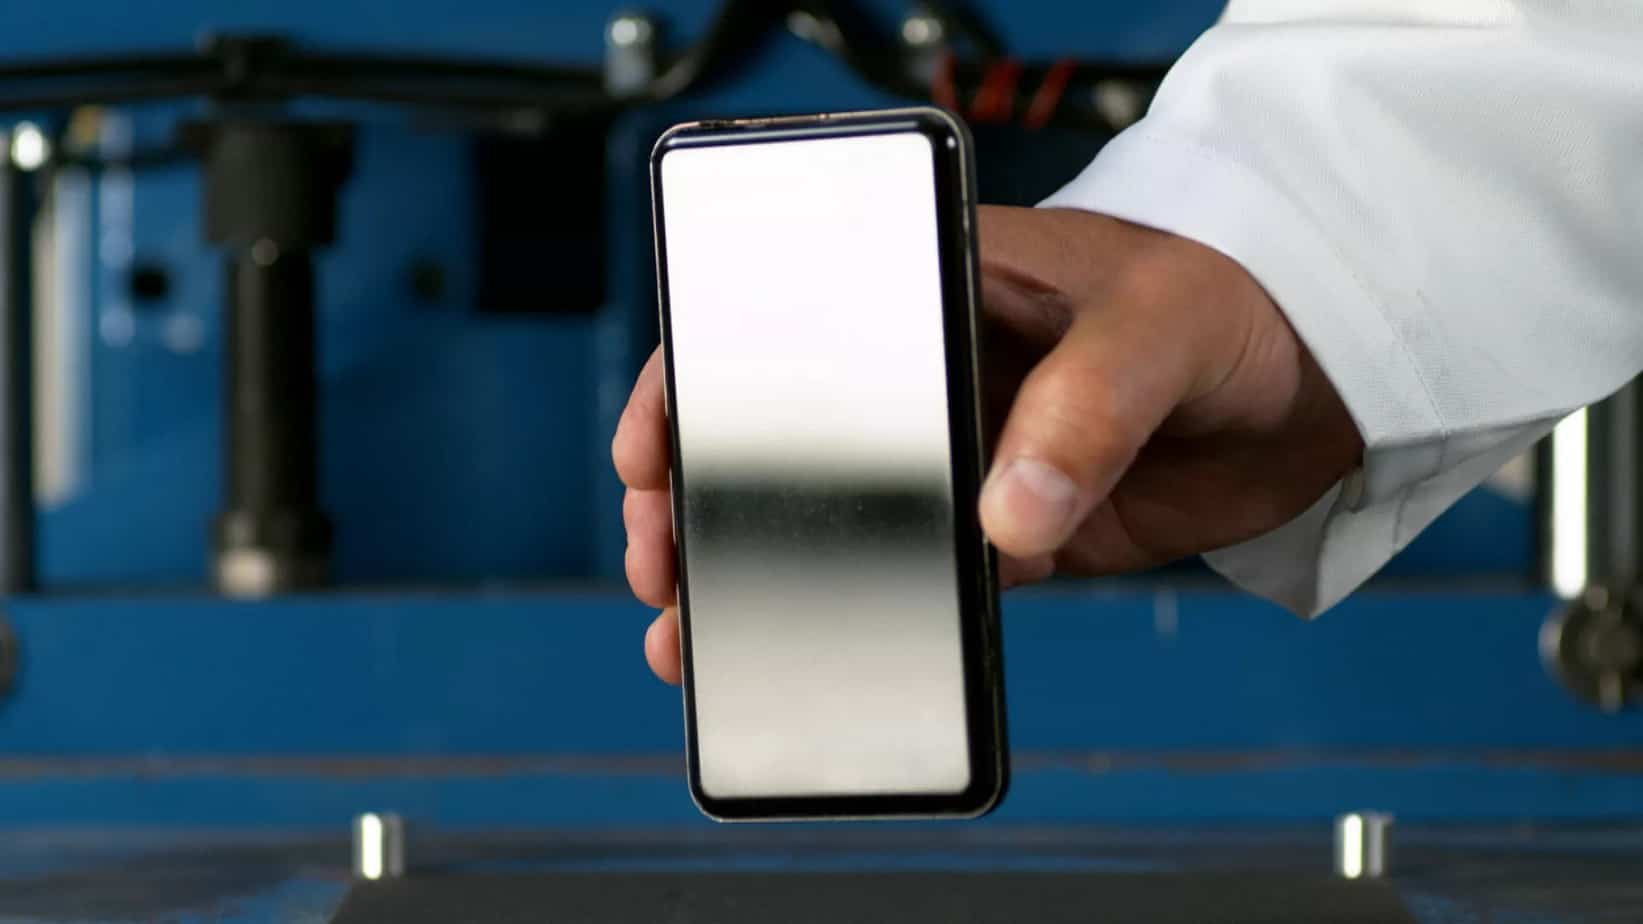 Corning's new Gorilla Glass protects smartphone camera lenses